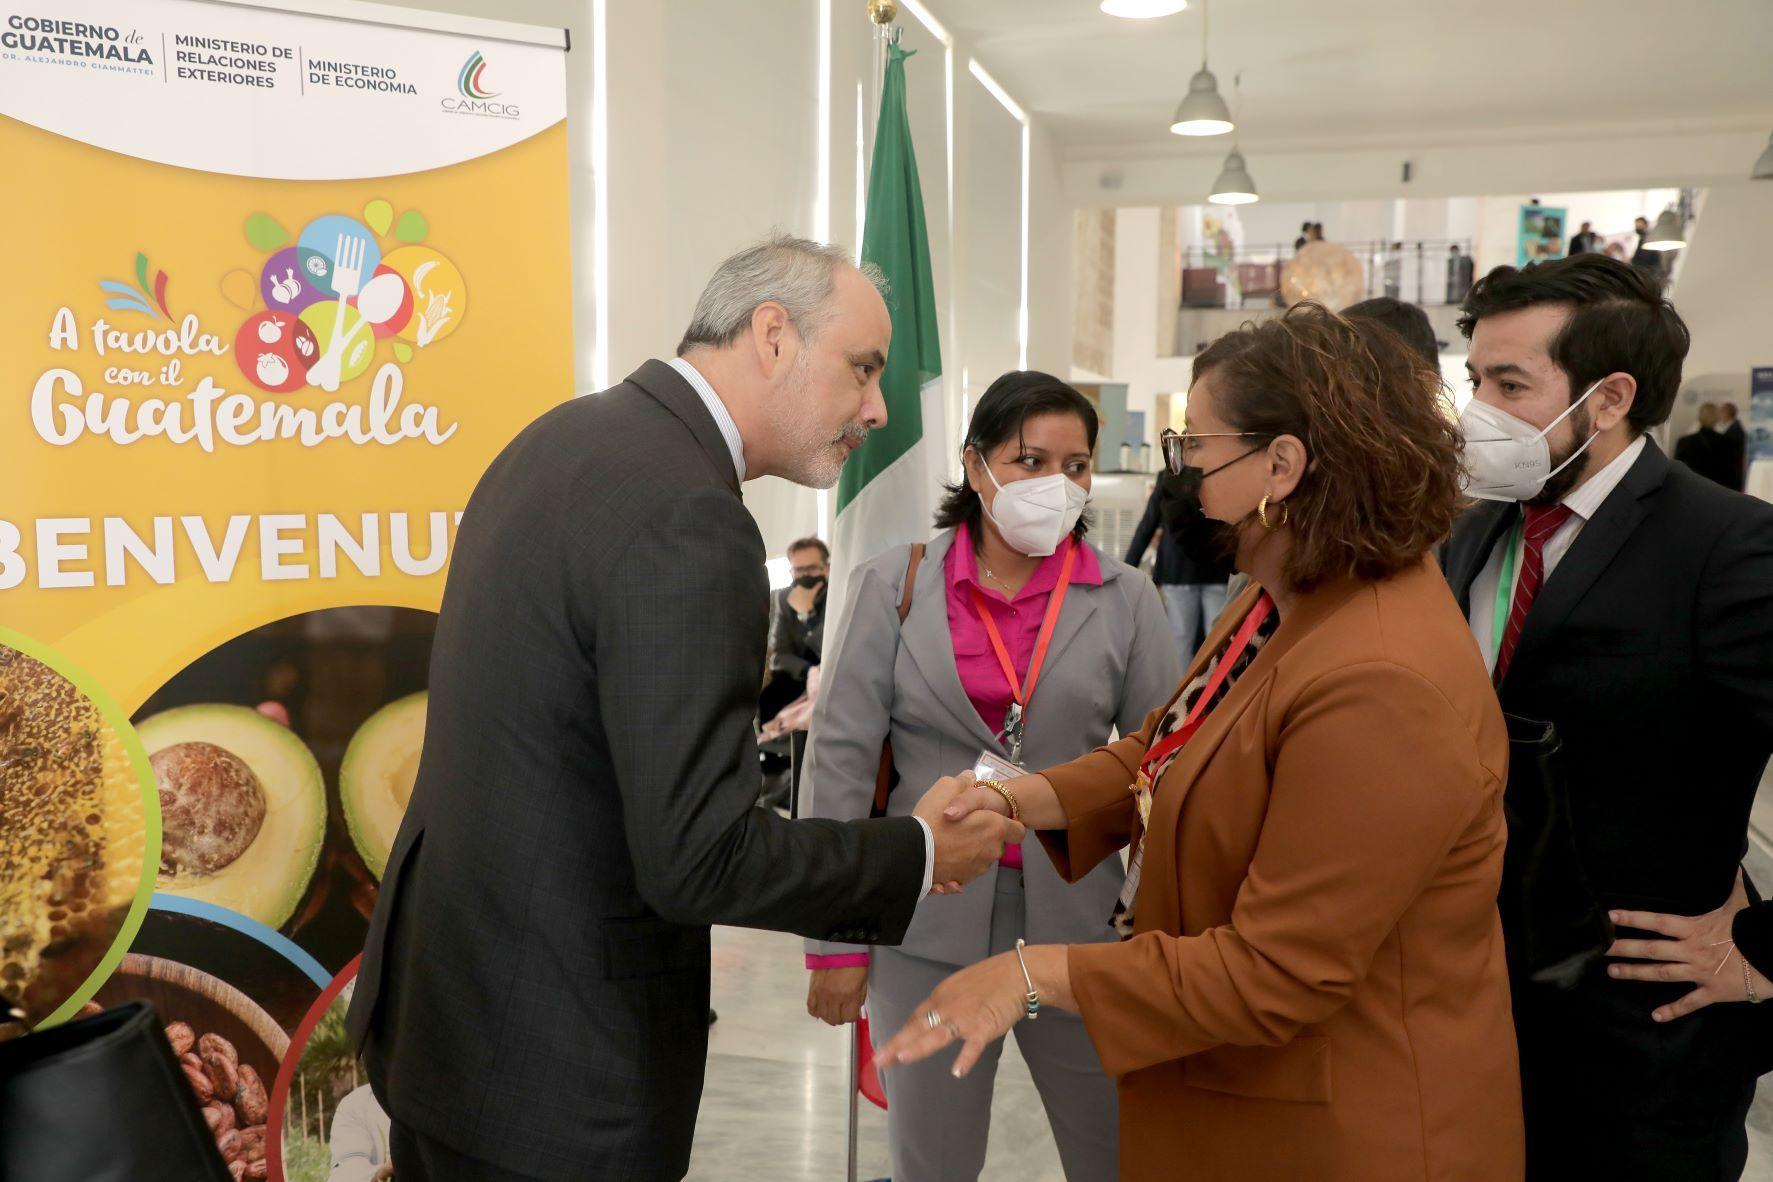 Embajada de Guatemala en Italia